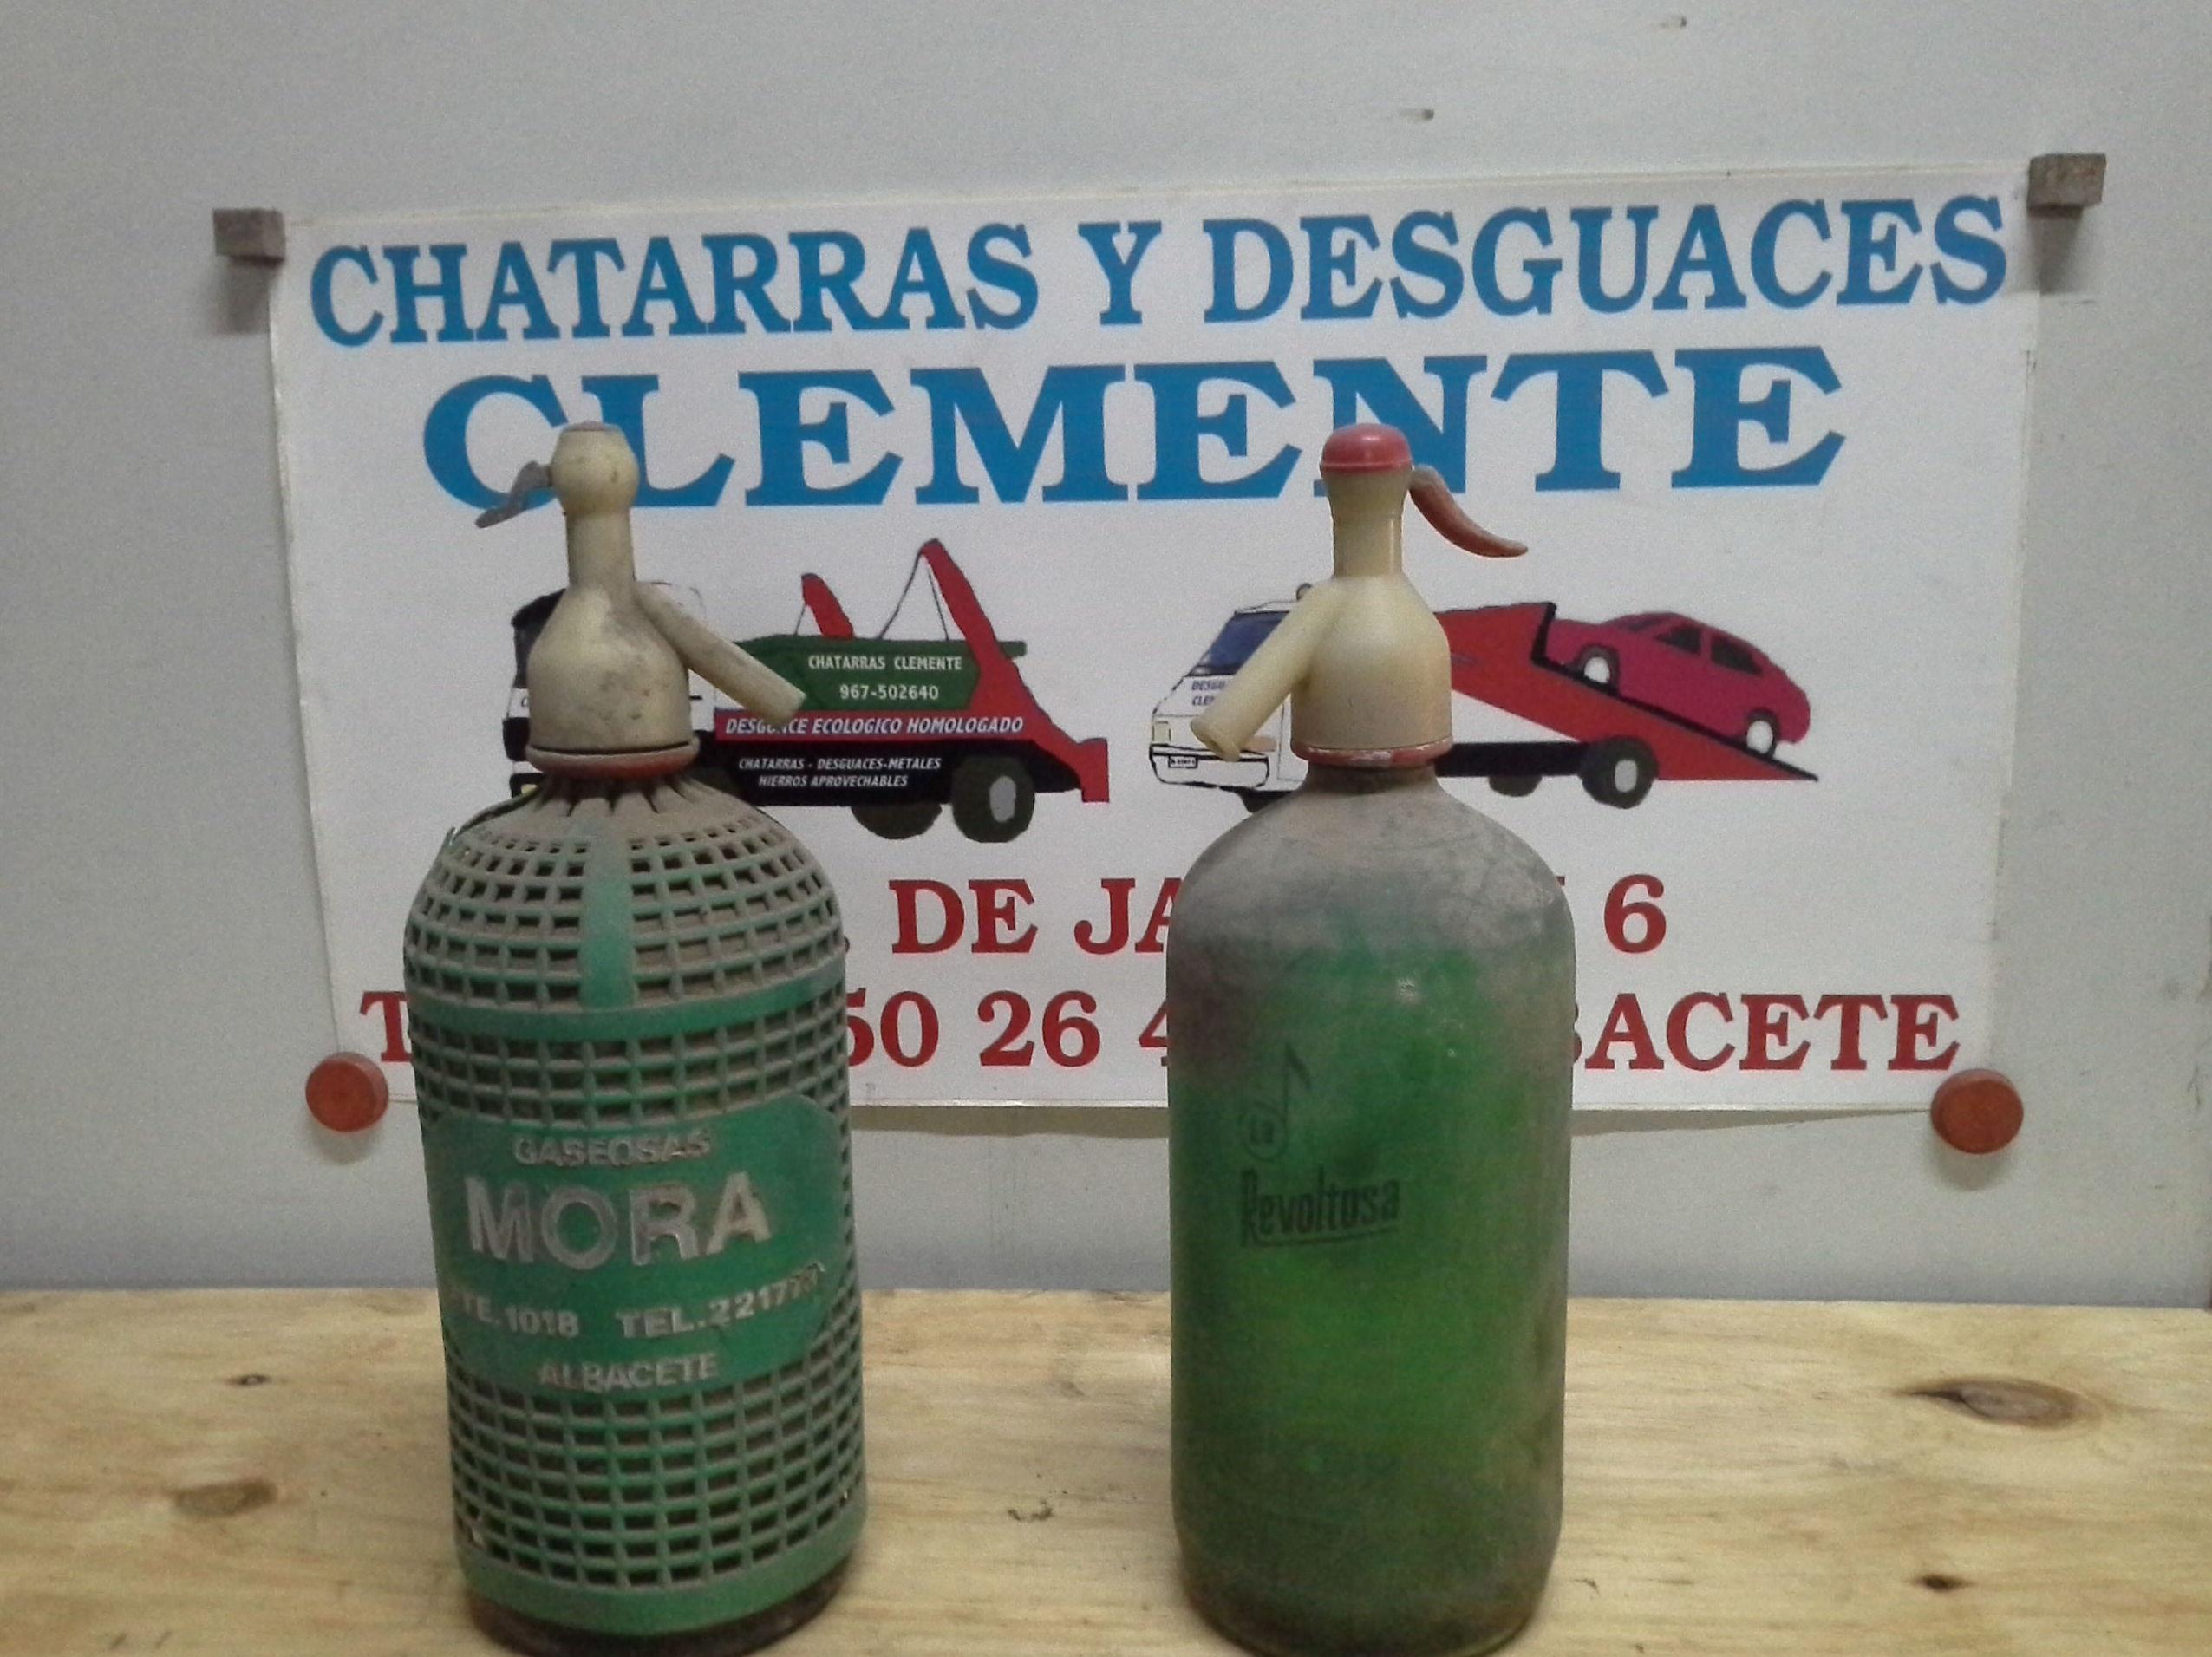 botellas de sifon antiguas en chatarras clemente de Albacete